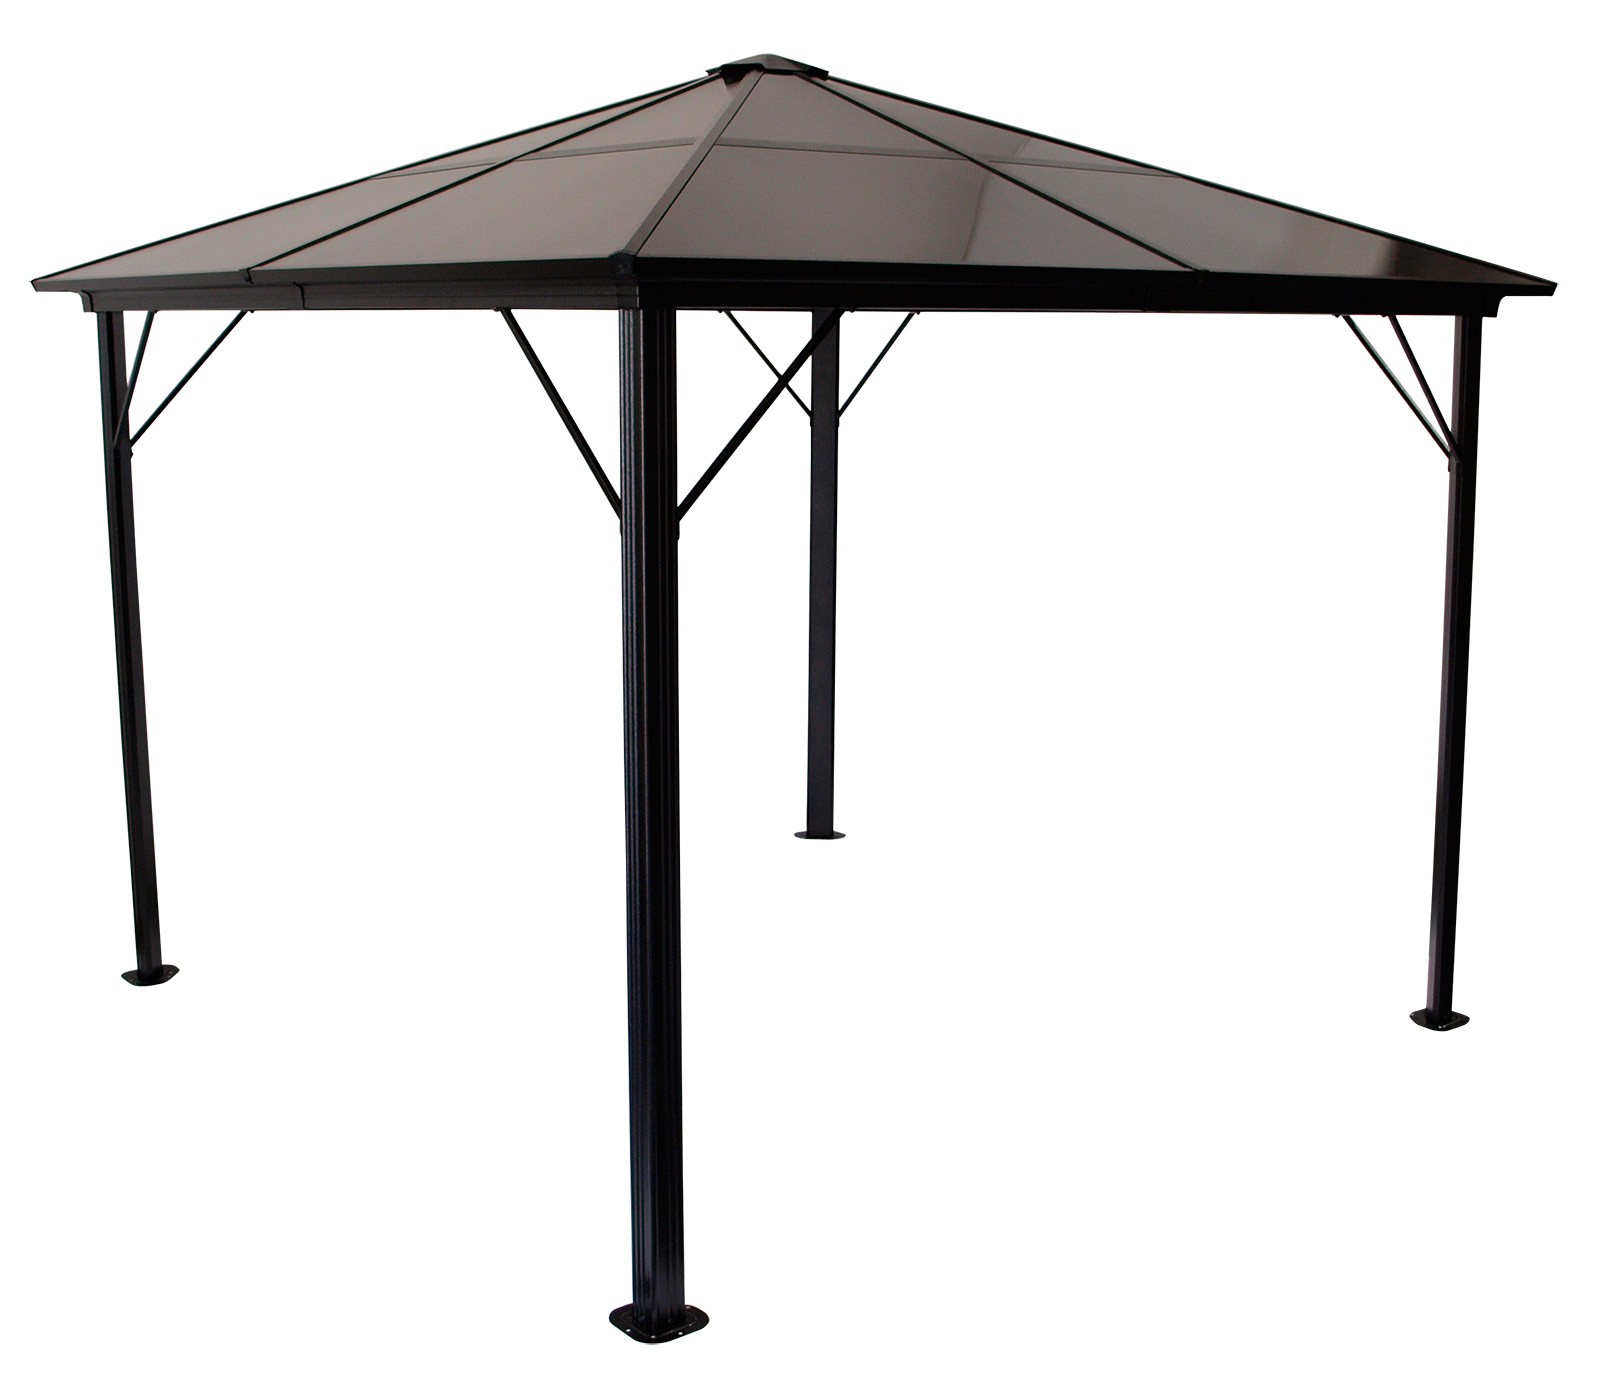 gartenpavillon pavillon metall pavillion montreal alu dach kunststoffplatten ebay. Black Bedroom Furniture Sets. Home Design Ideas